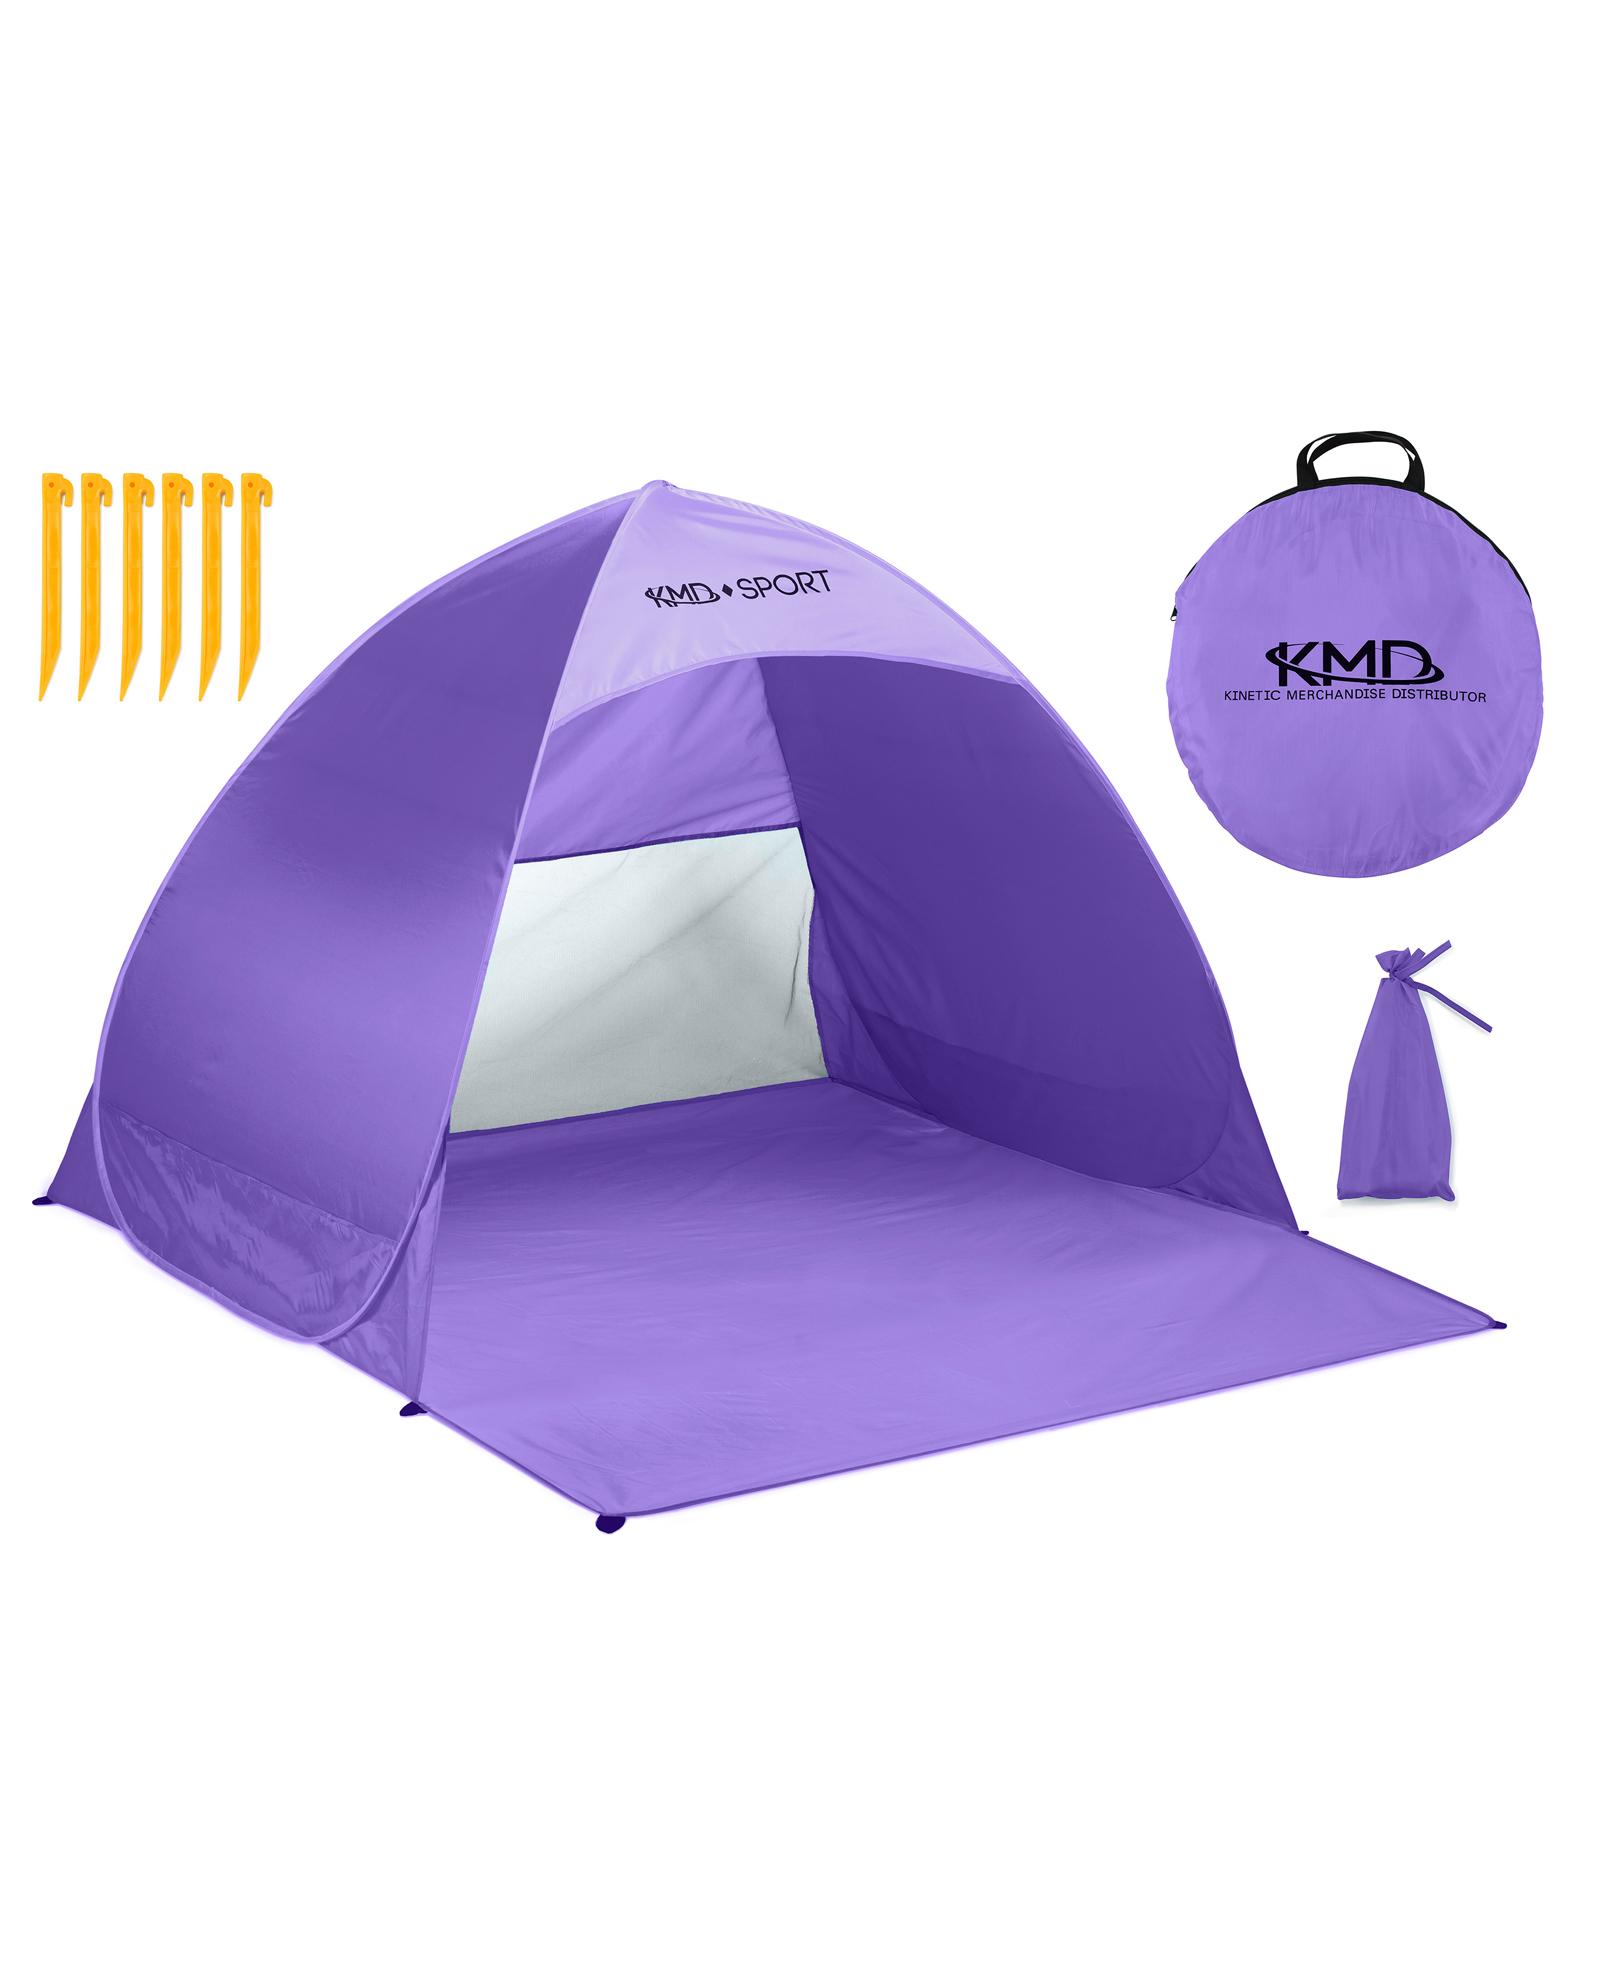 Beach Pop Up Tent u2013 Lightweigh... $35.99  sc 1 st  KMD Direct & Beach Pop Up Tent u2013 Lightweight Portable Cabana for Privacy ...